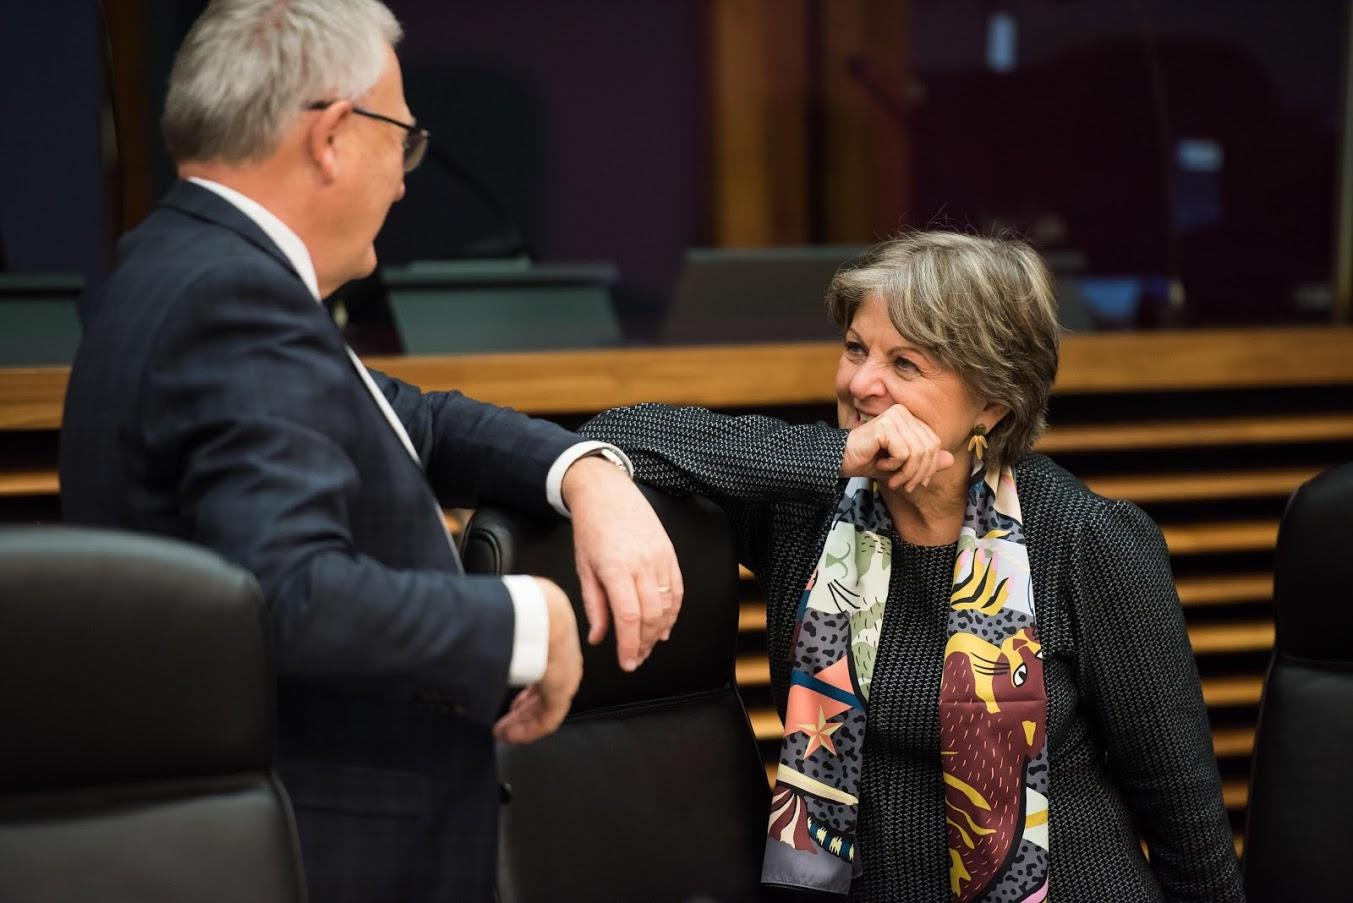 Commissari Ferreira e Schmit - Photo credit: European Union 2019 Photographer: Aurore Martignoni